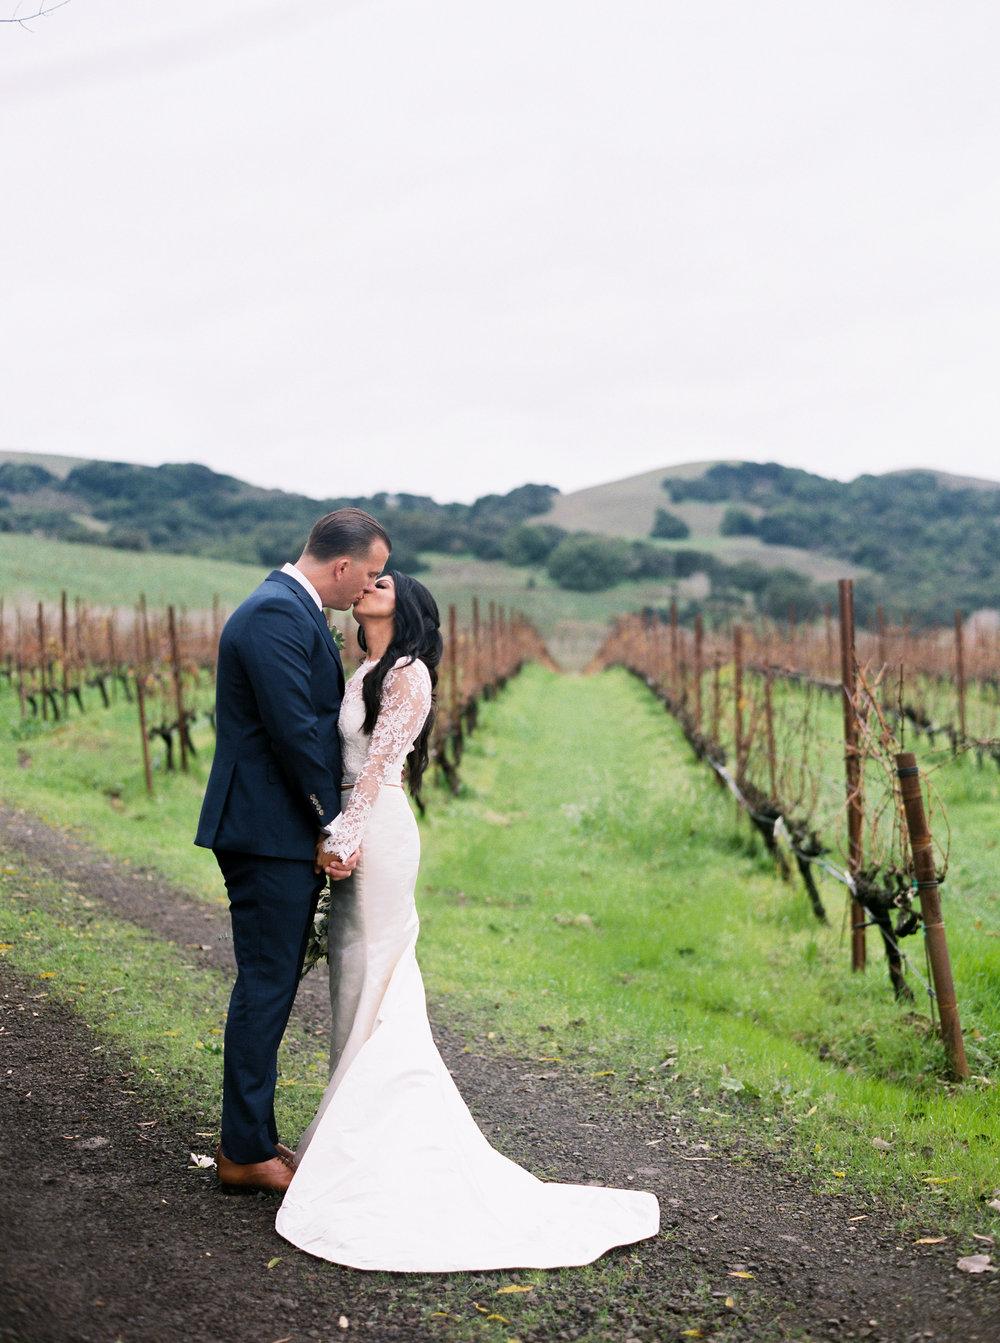 romantic-wedding-at-cline-winery-in-sonoma-california-1-10.jpg